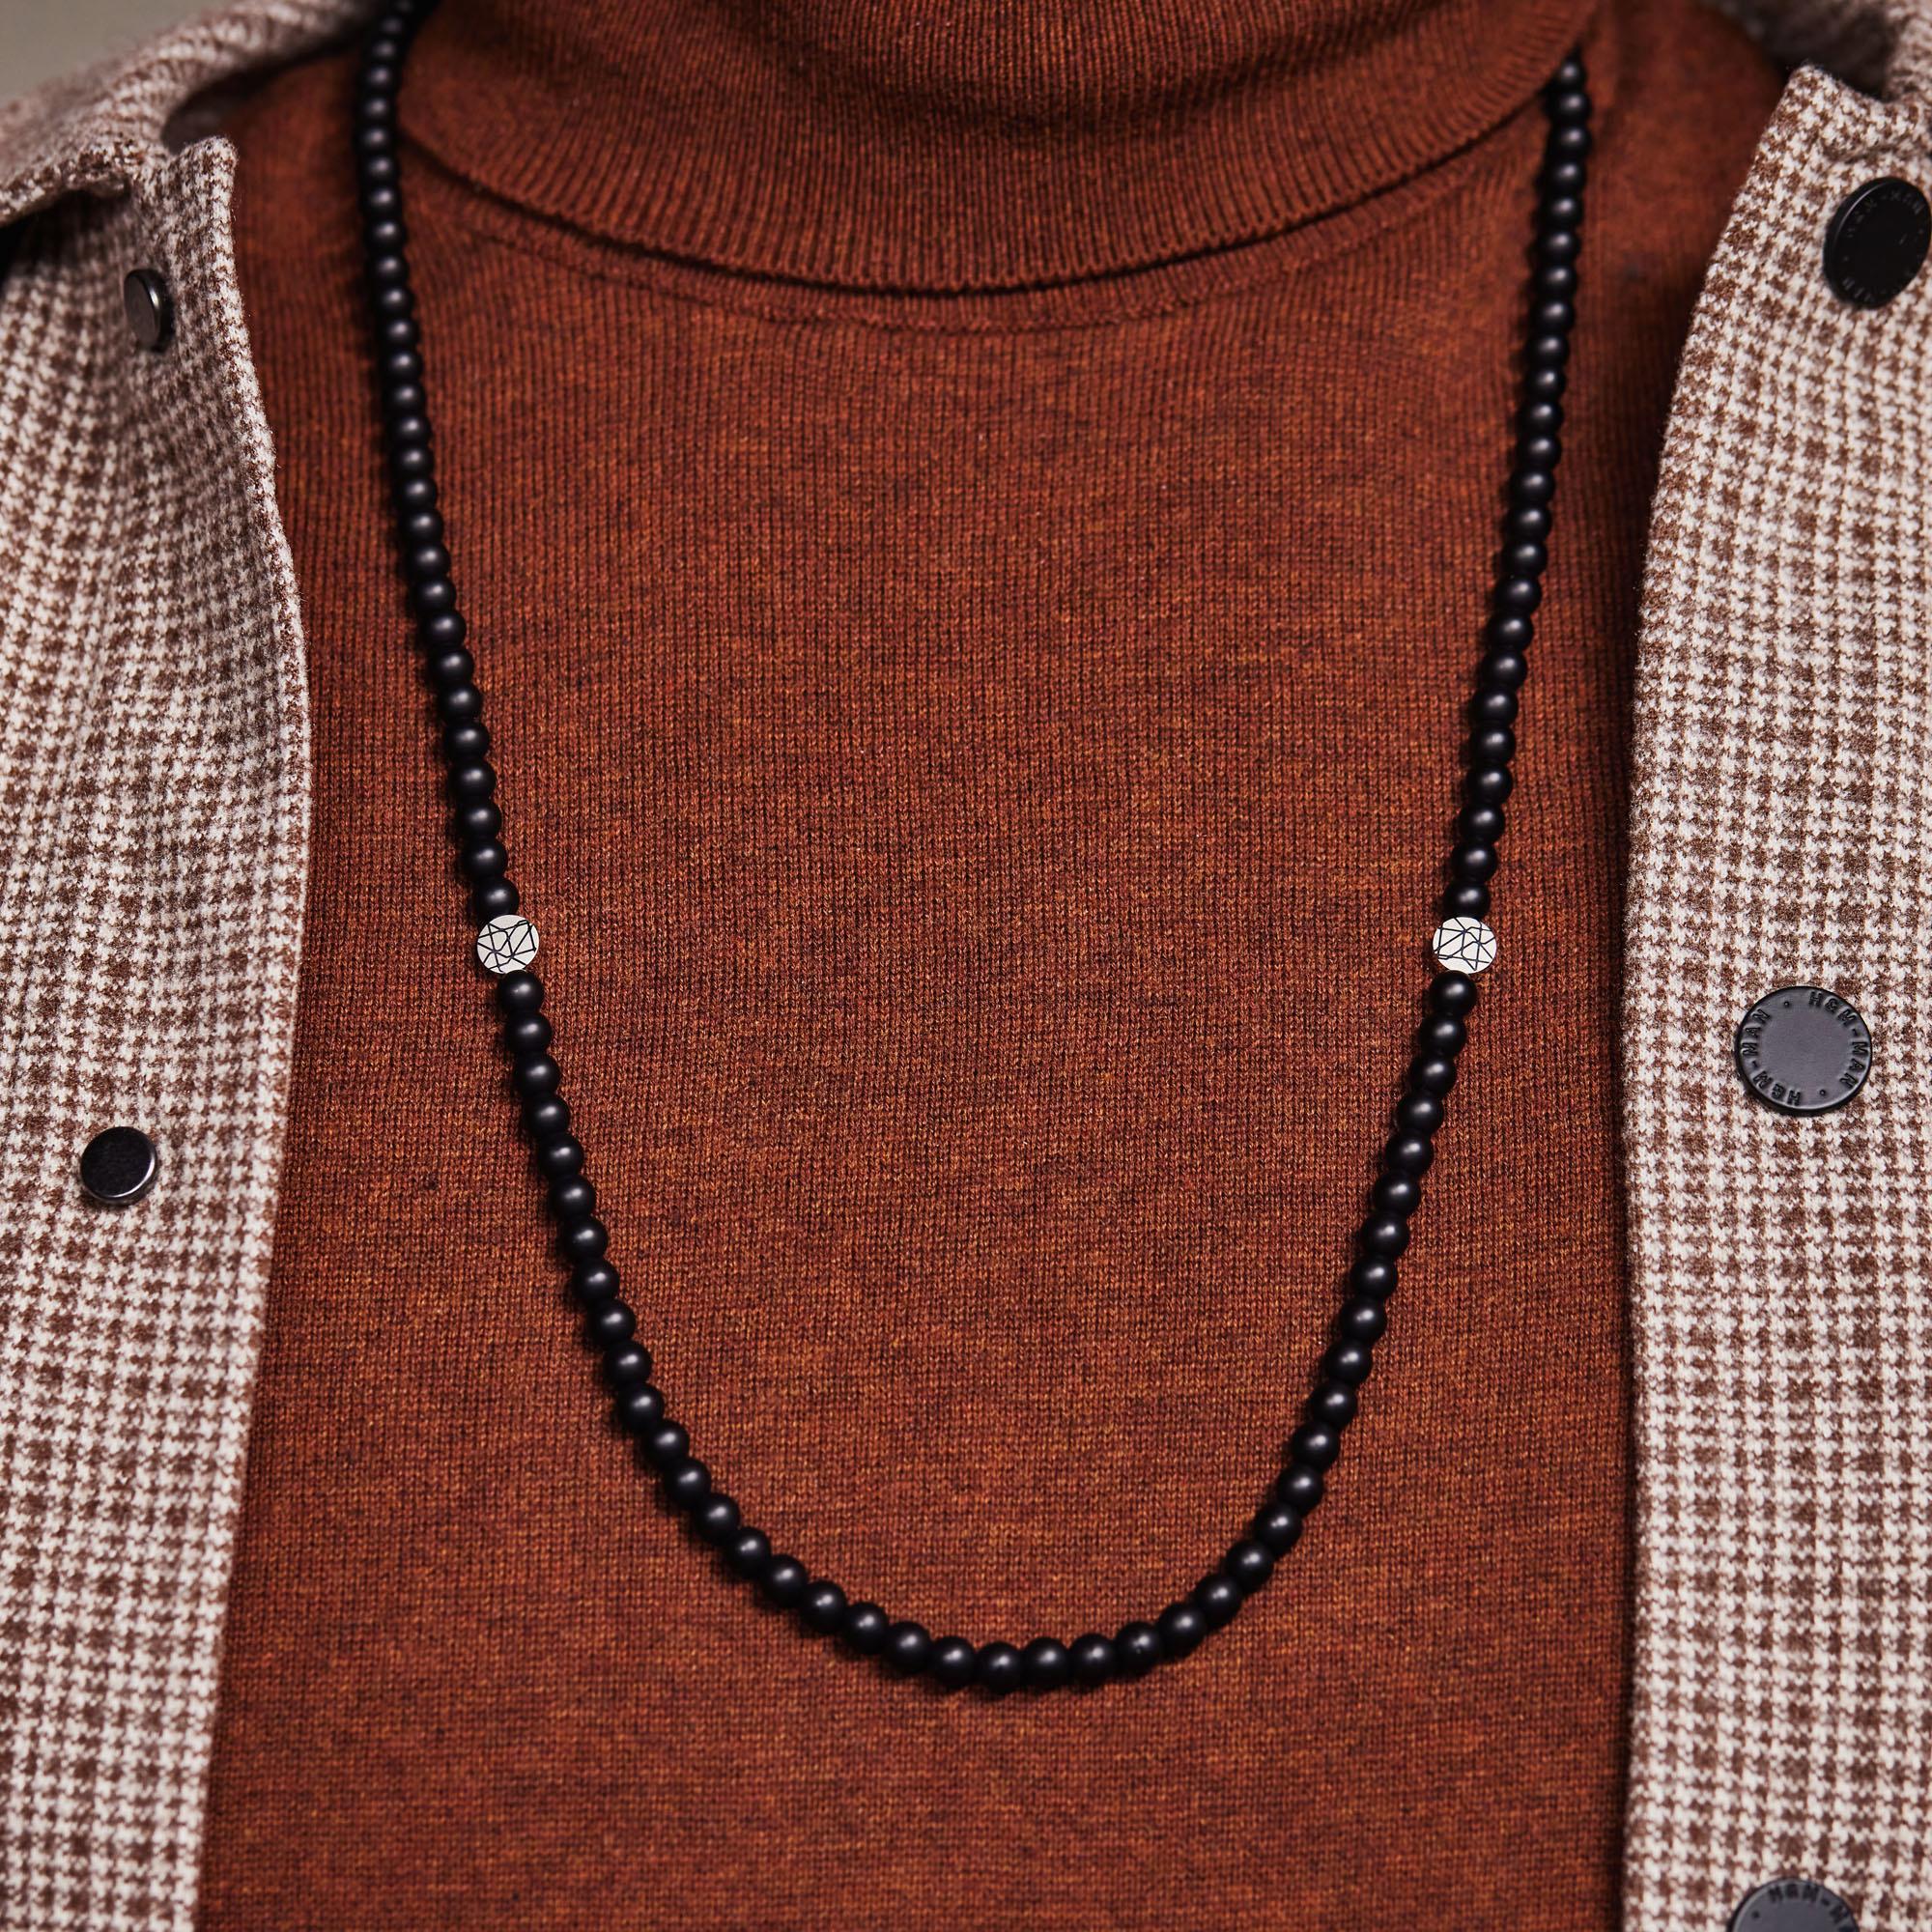 Sem Lewis Piccadilly South Kensington collana di perline nero